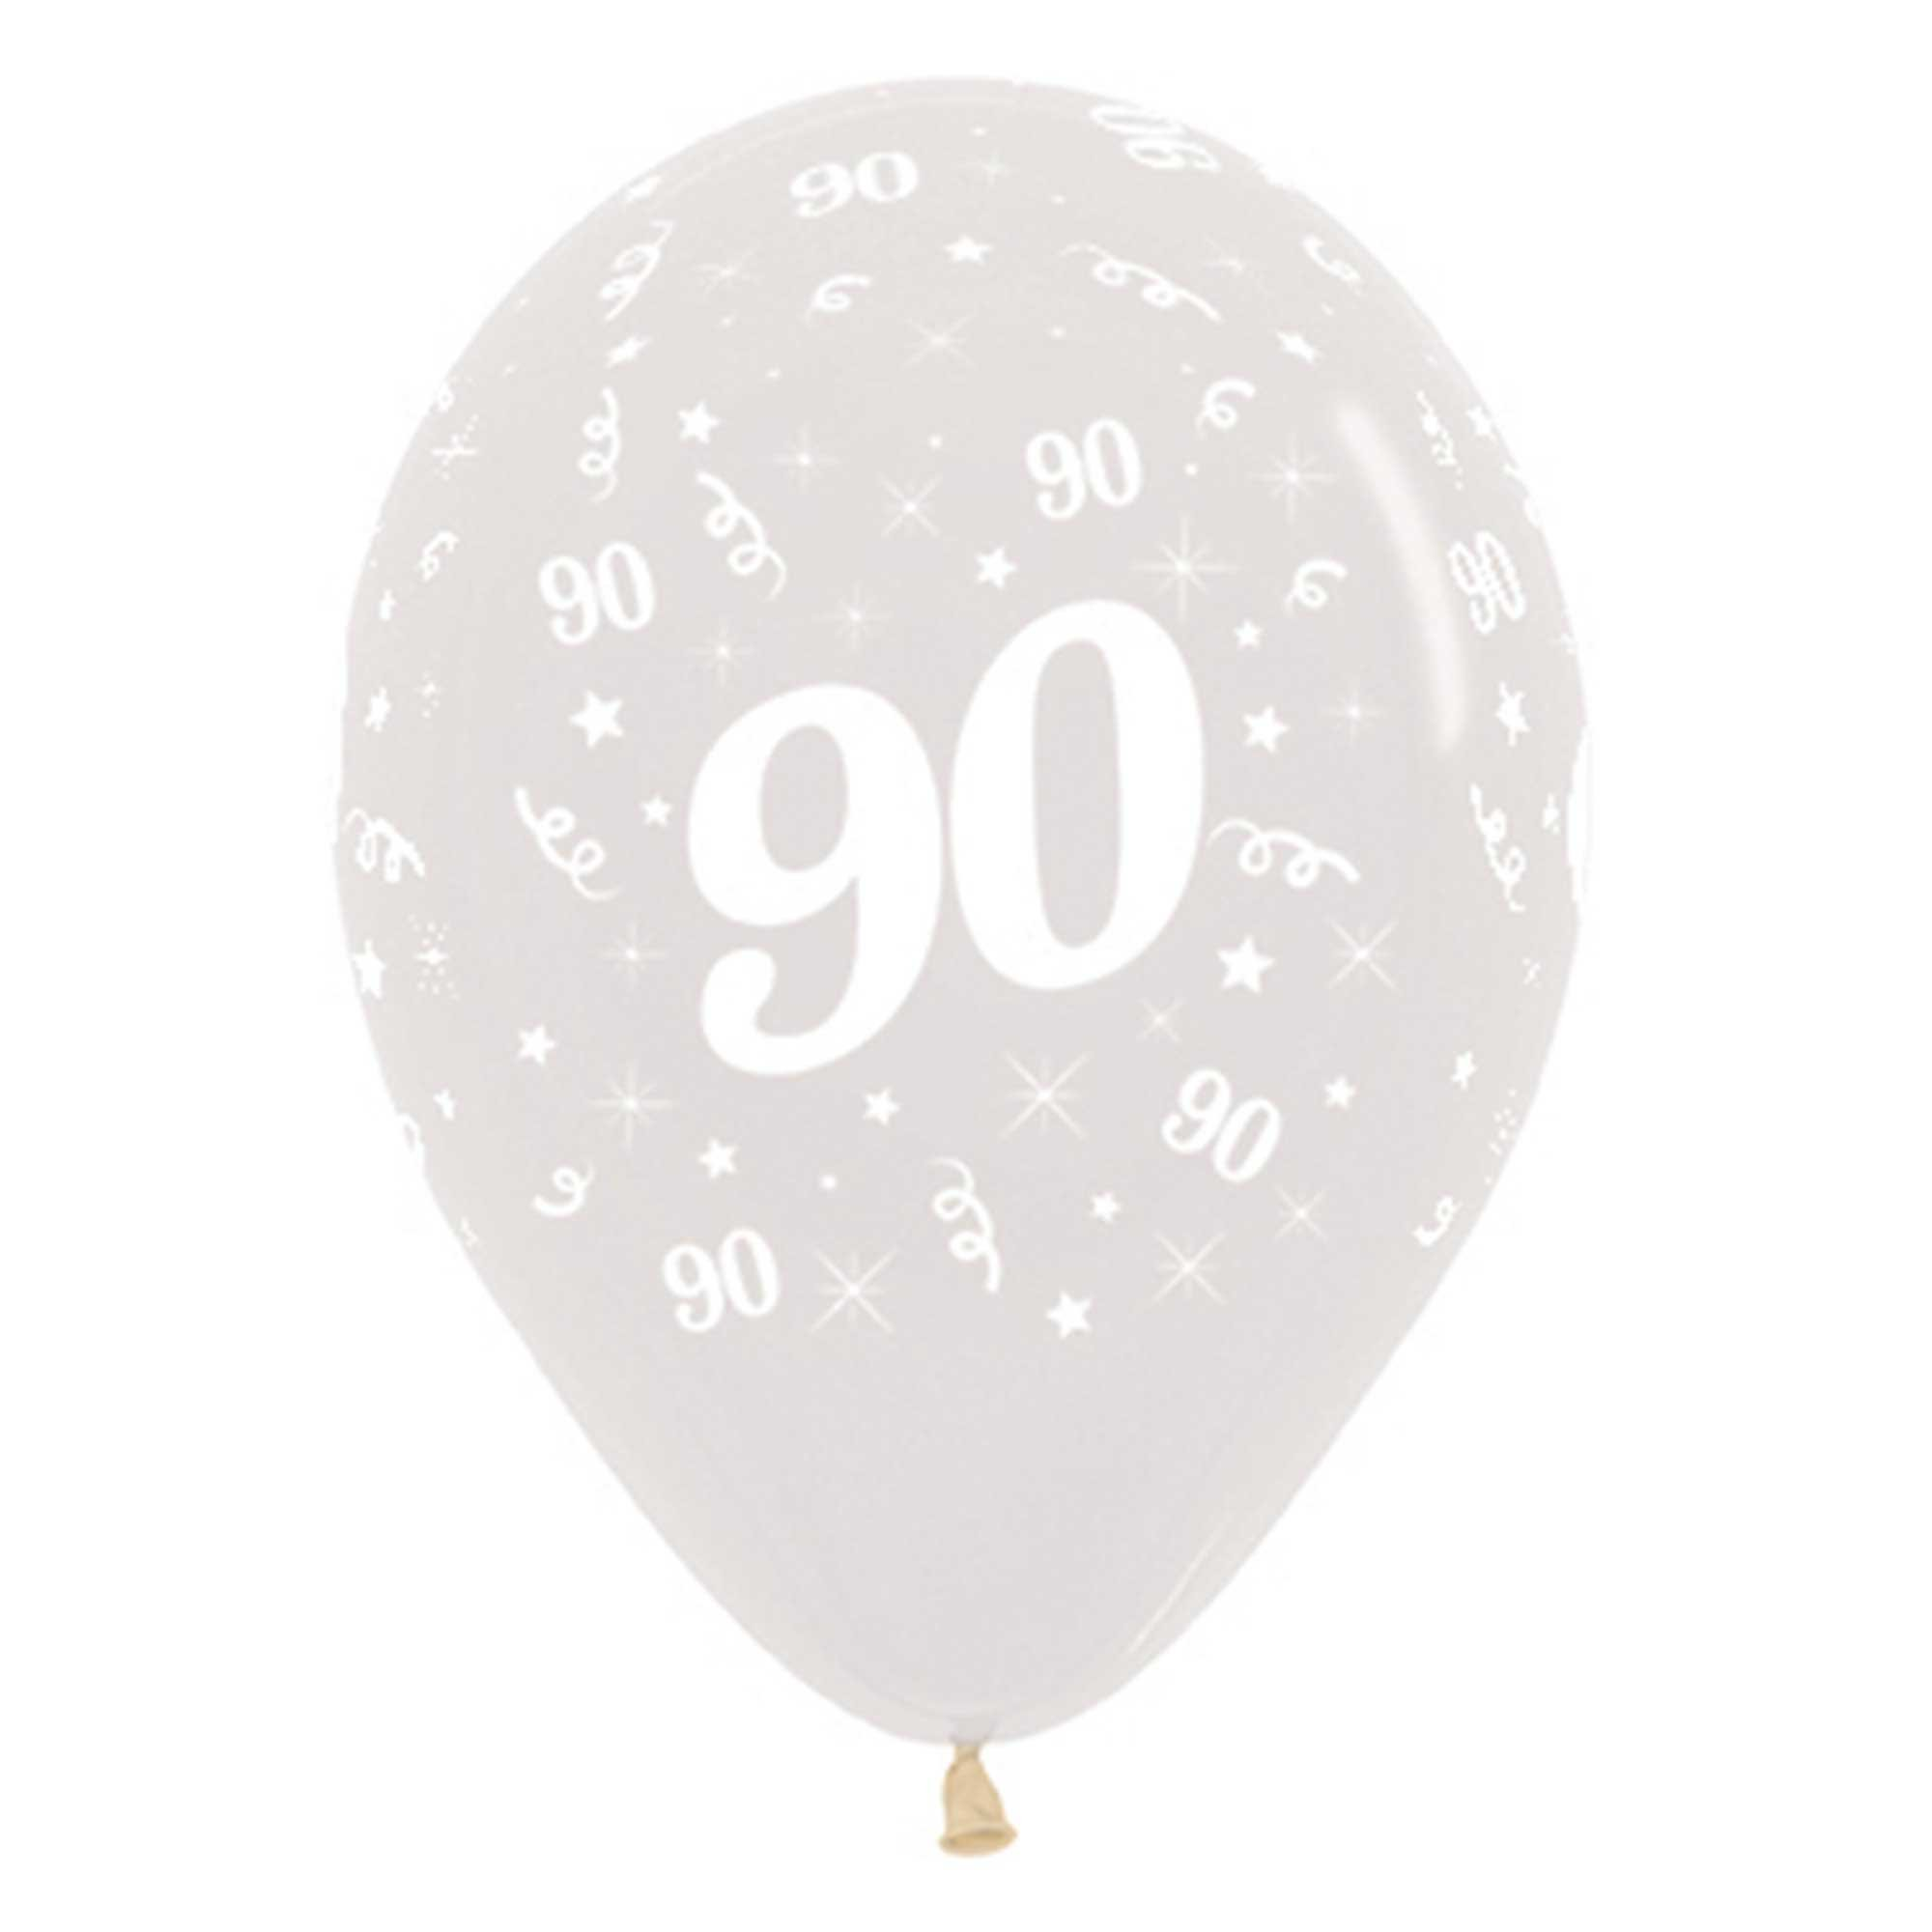 Sempertex 30cm Age 90 Crystal Clear Latex Balloons, 25PK